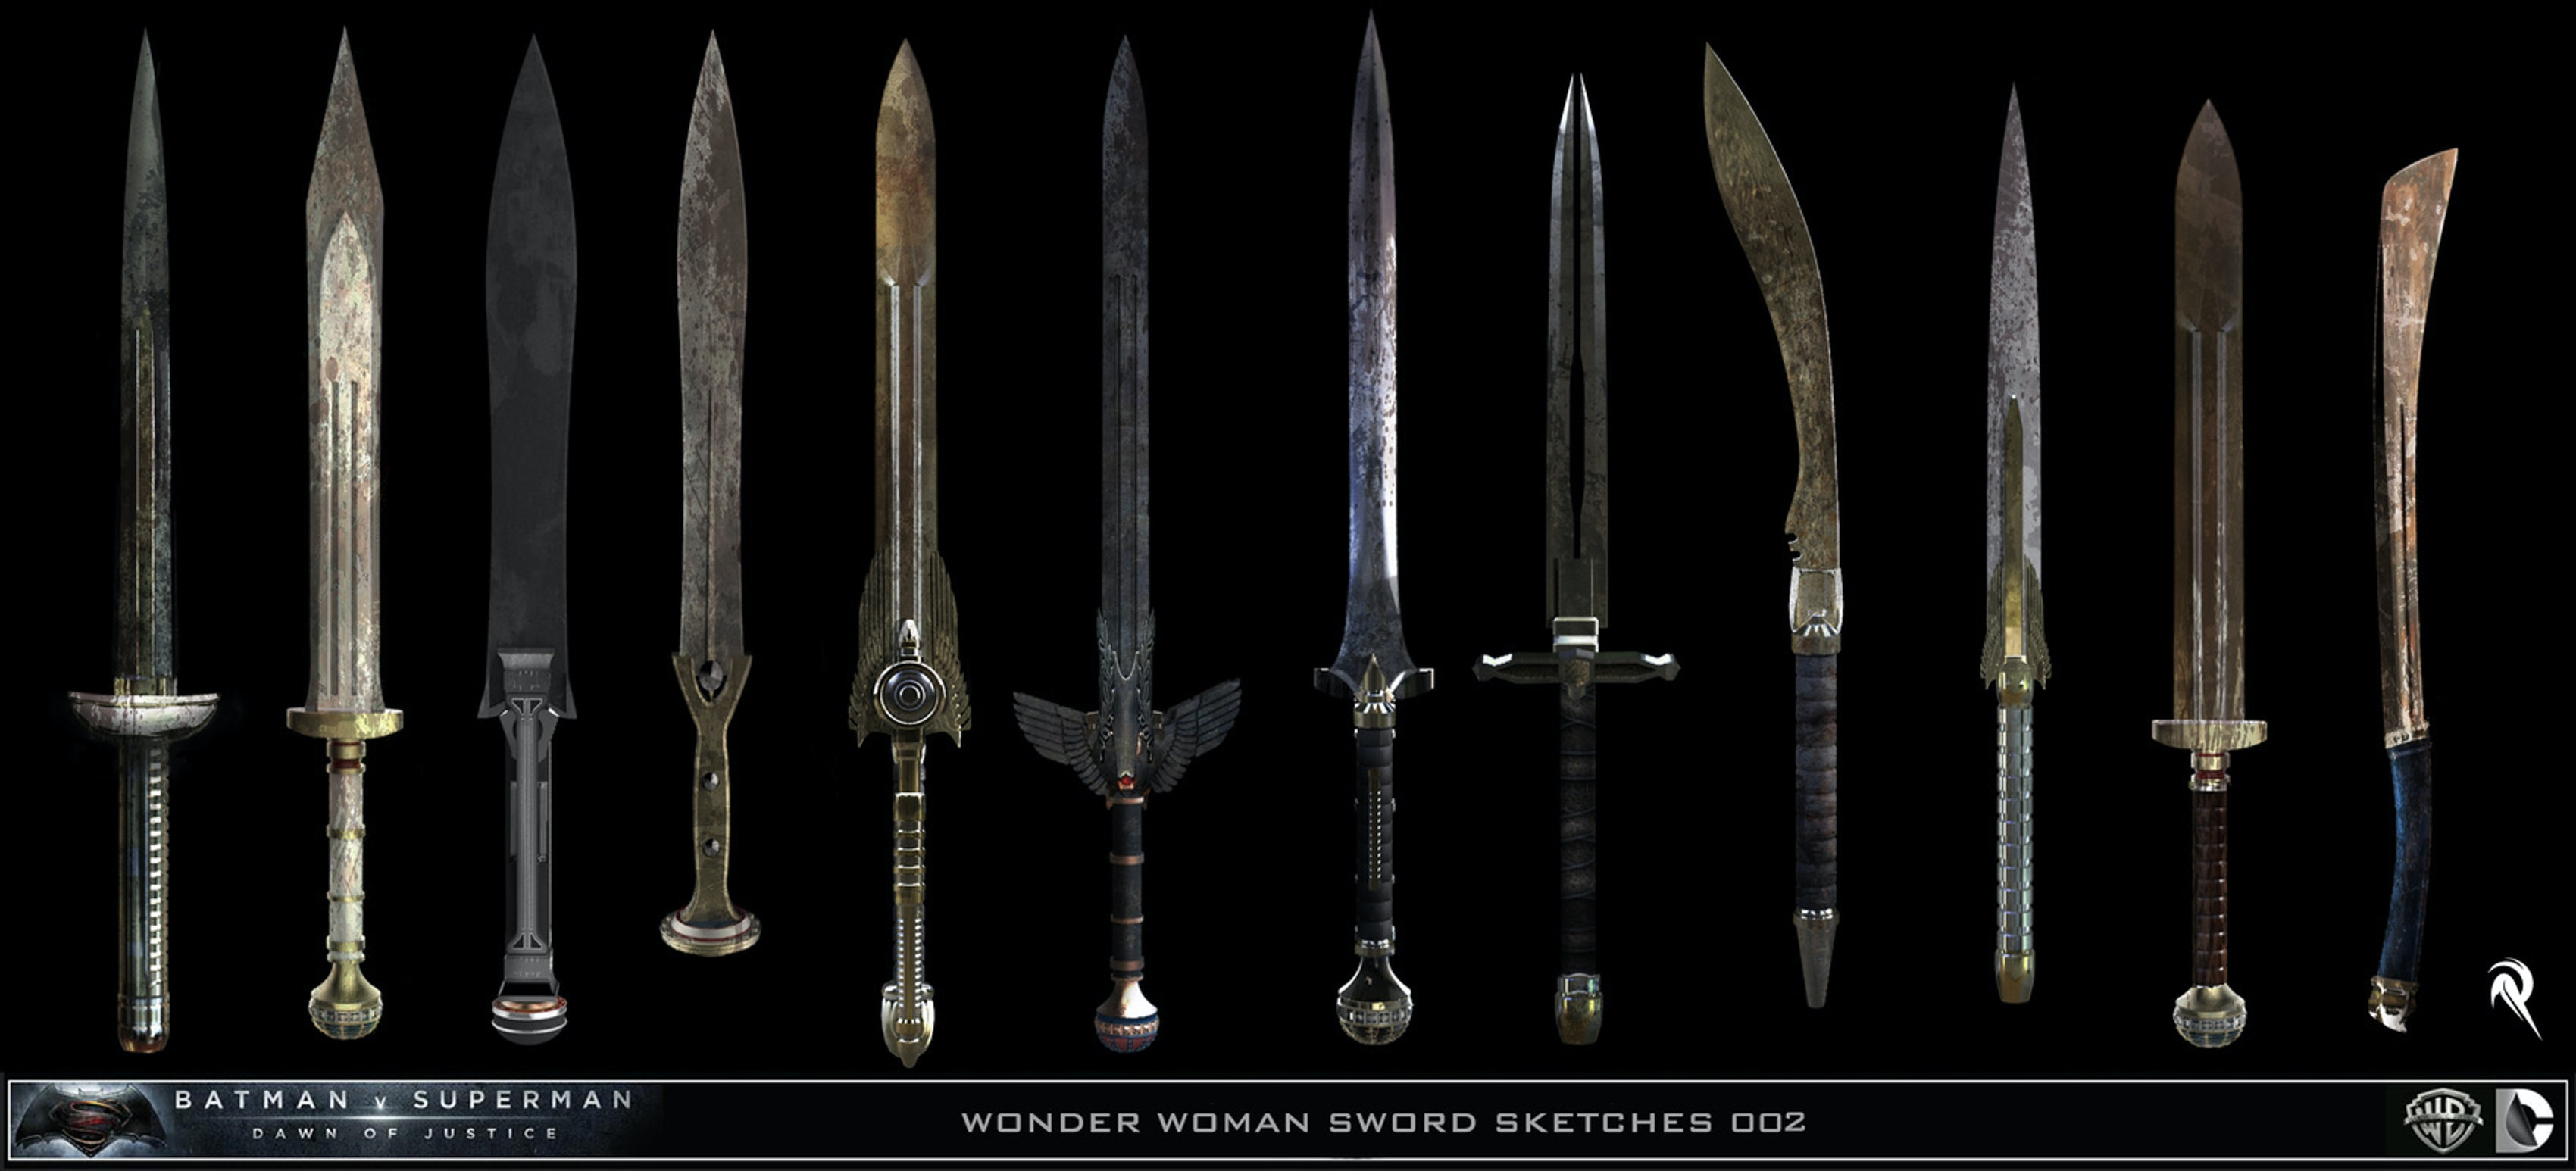 Designs for Wonder Woman's Sword from Batman v Superman